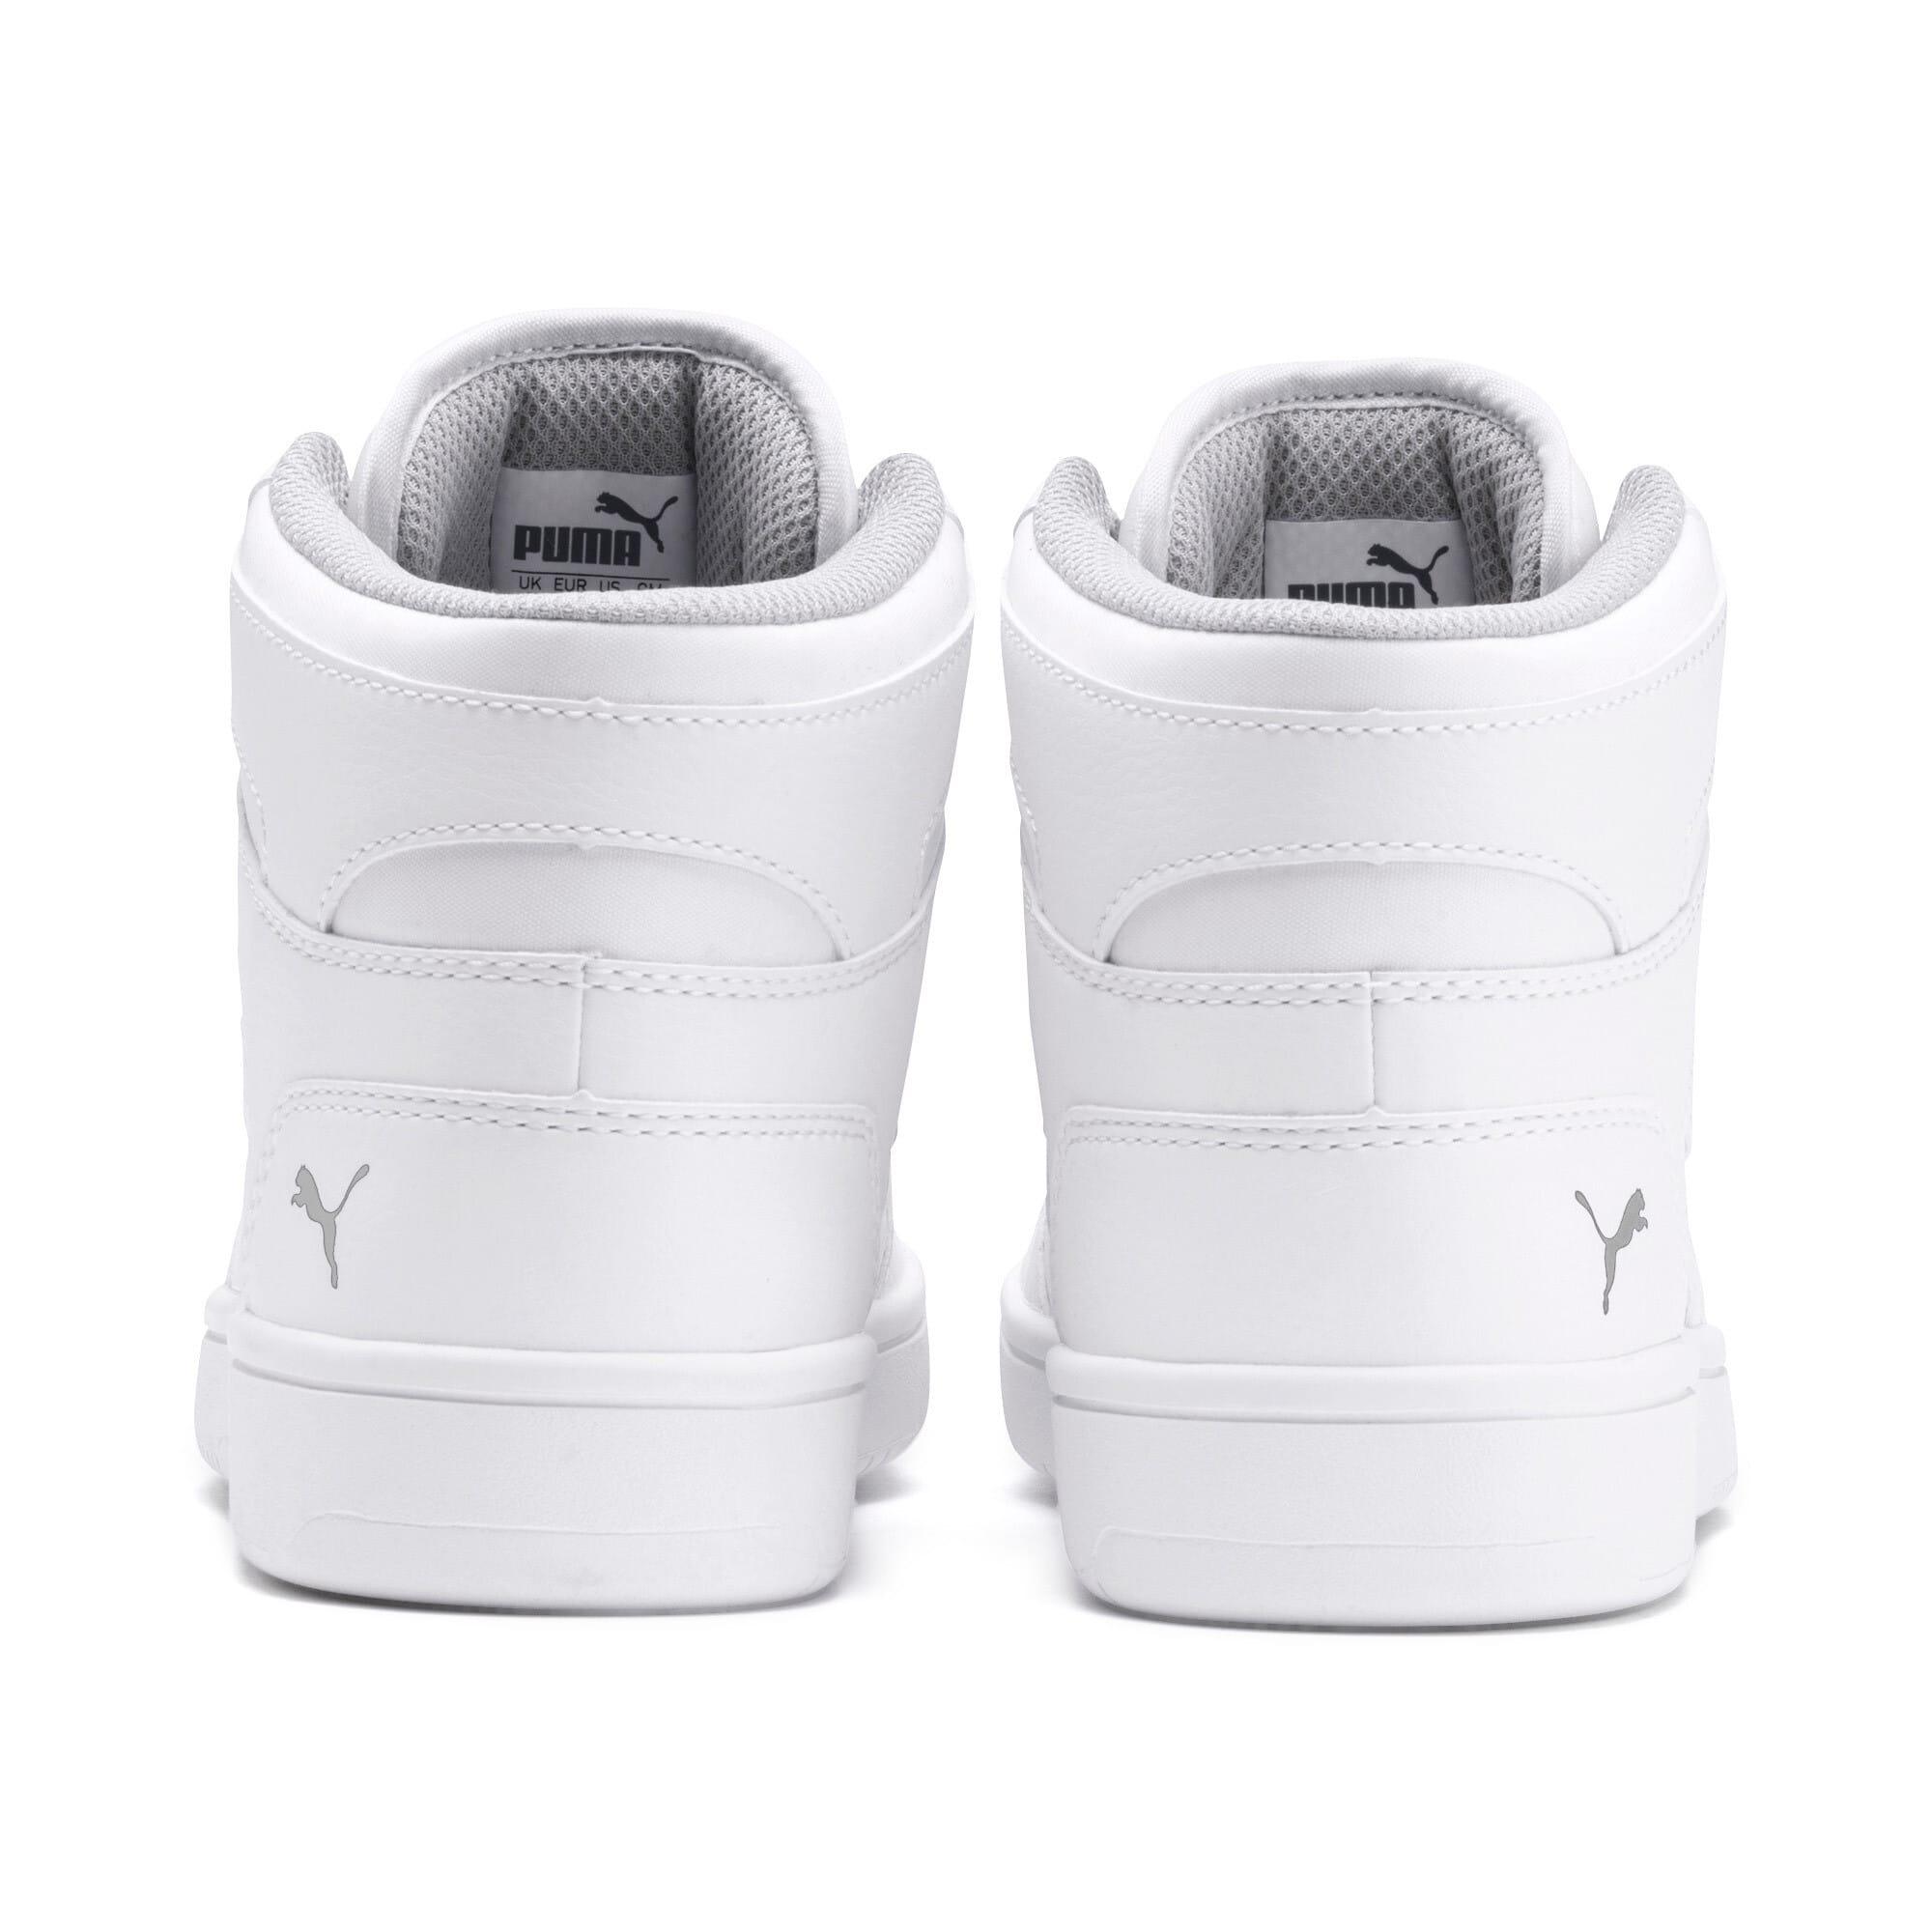 Thumbnail 3 of PUMA Rebound LayUp Mid Sneakers JR, Puma White-Gray Violet, medium